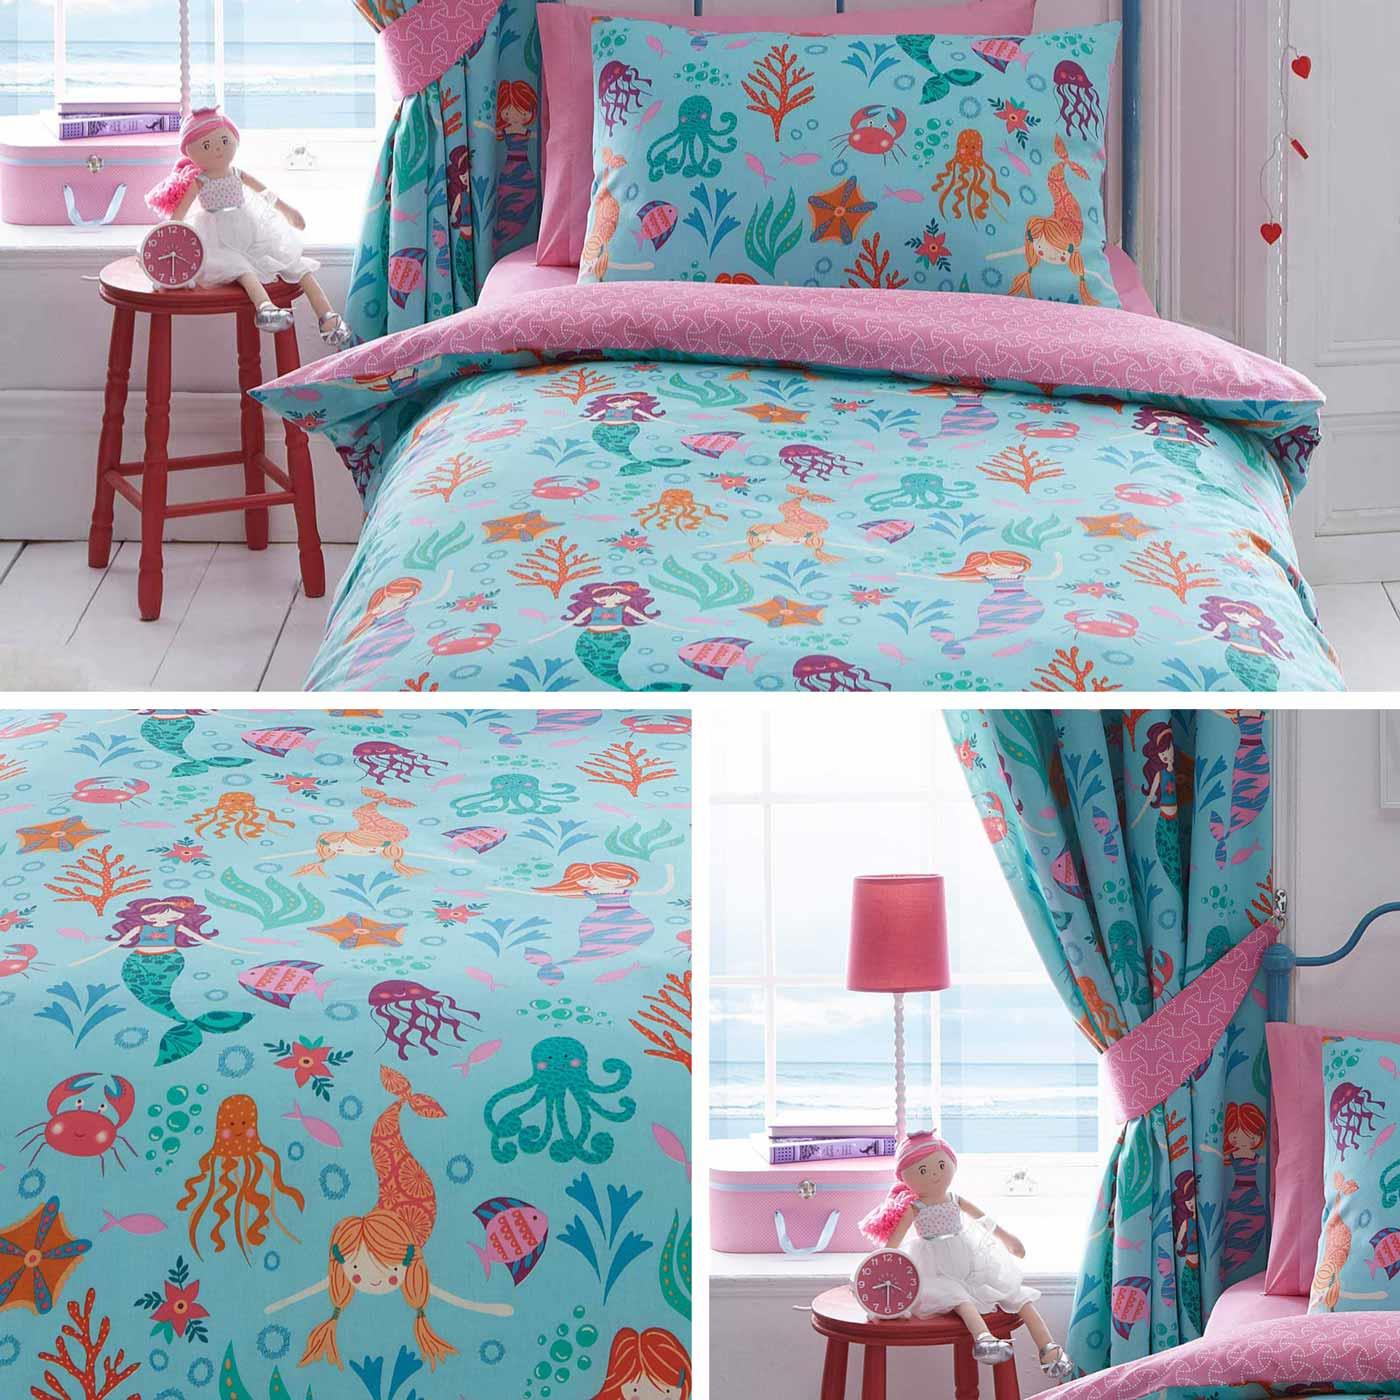 Blue Duvet Covers Mermaids Underwater Pink Kids Quilt Cover Bedding Sets Ebay